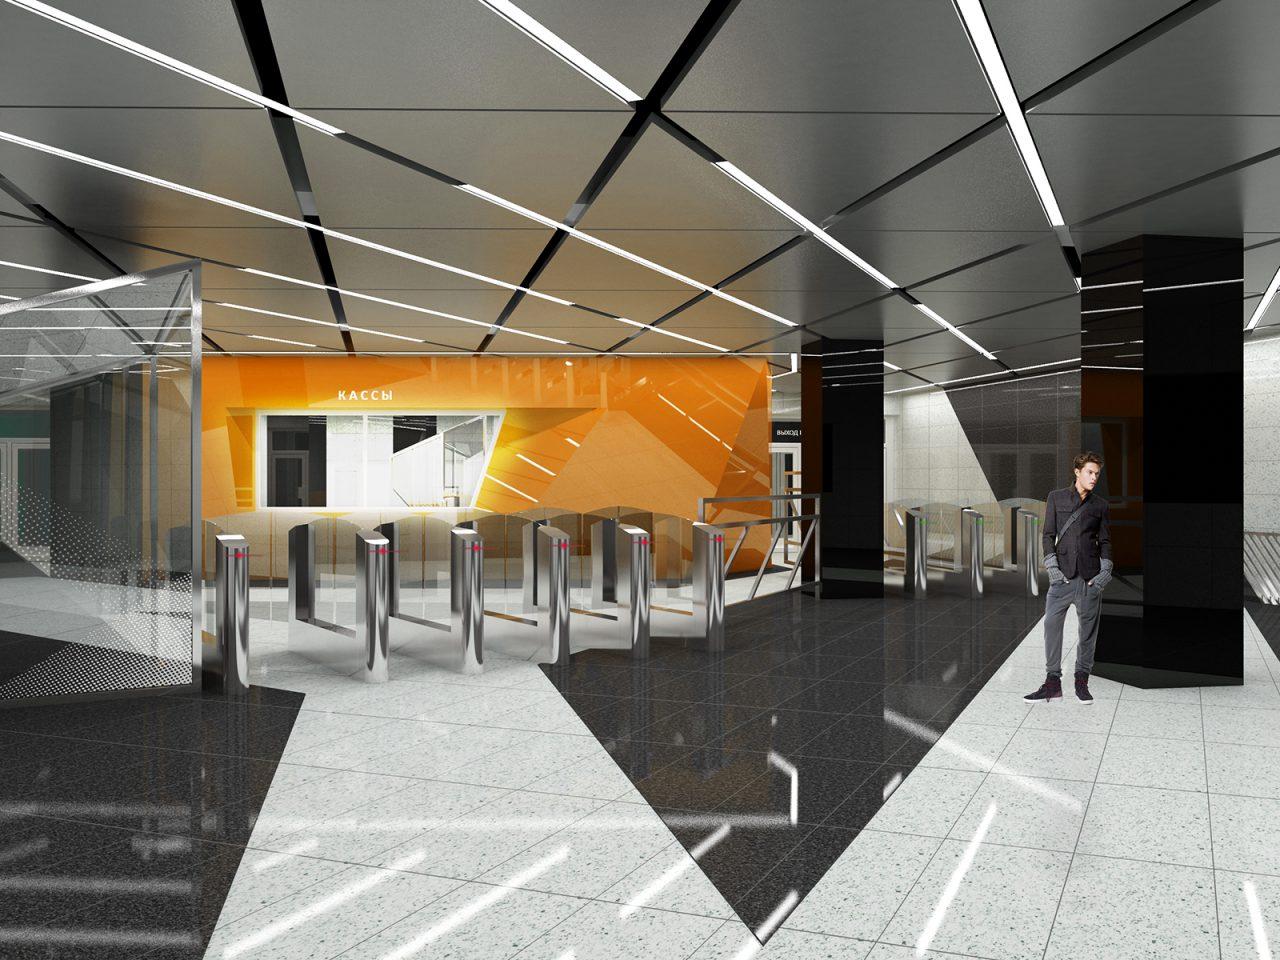 Монтаж декоративного потолка начался на станции БКЛ «Воронцовская»